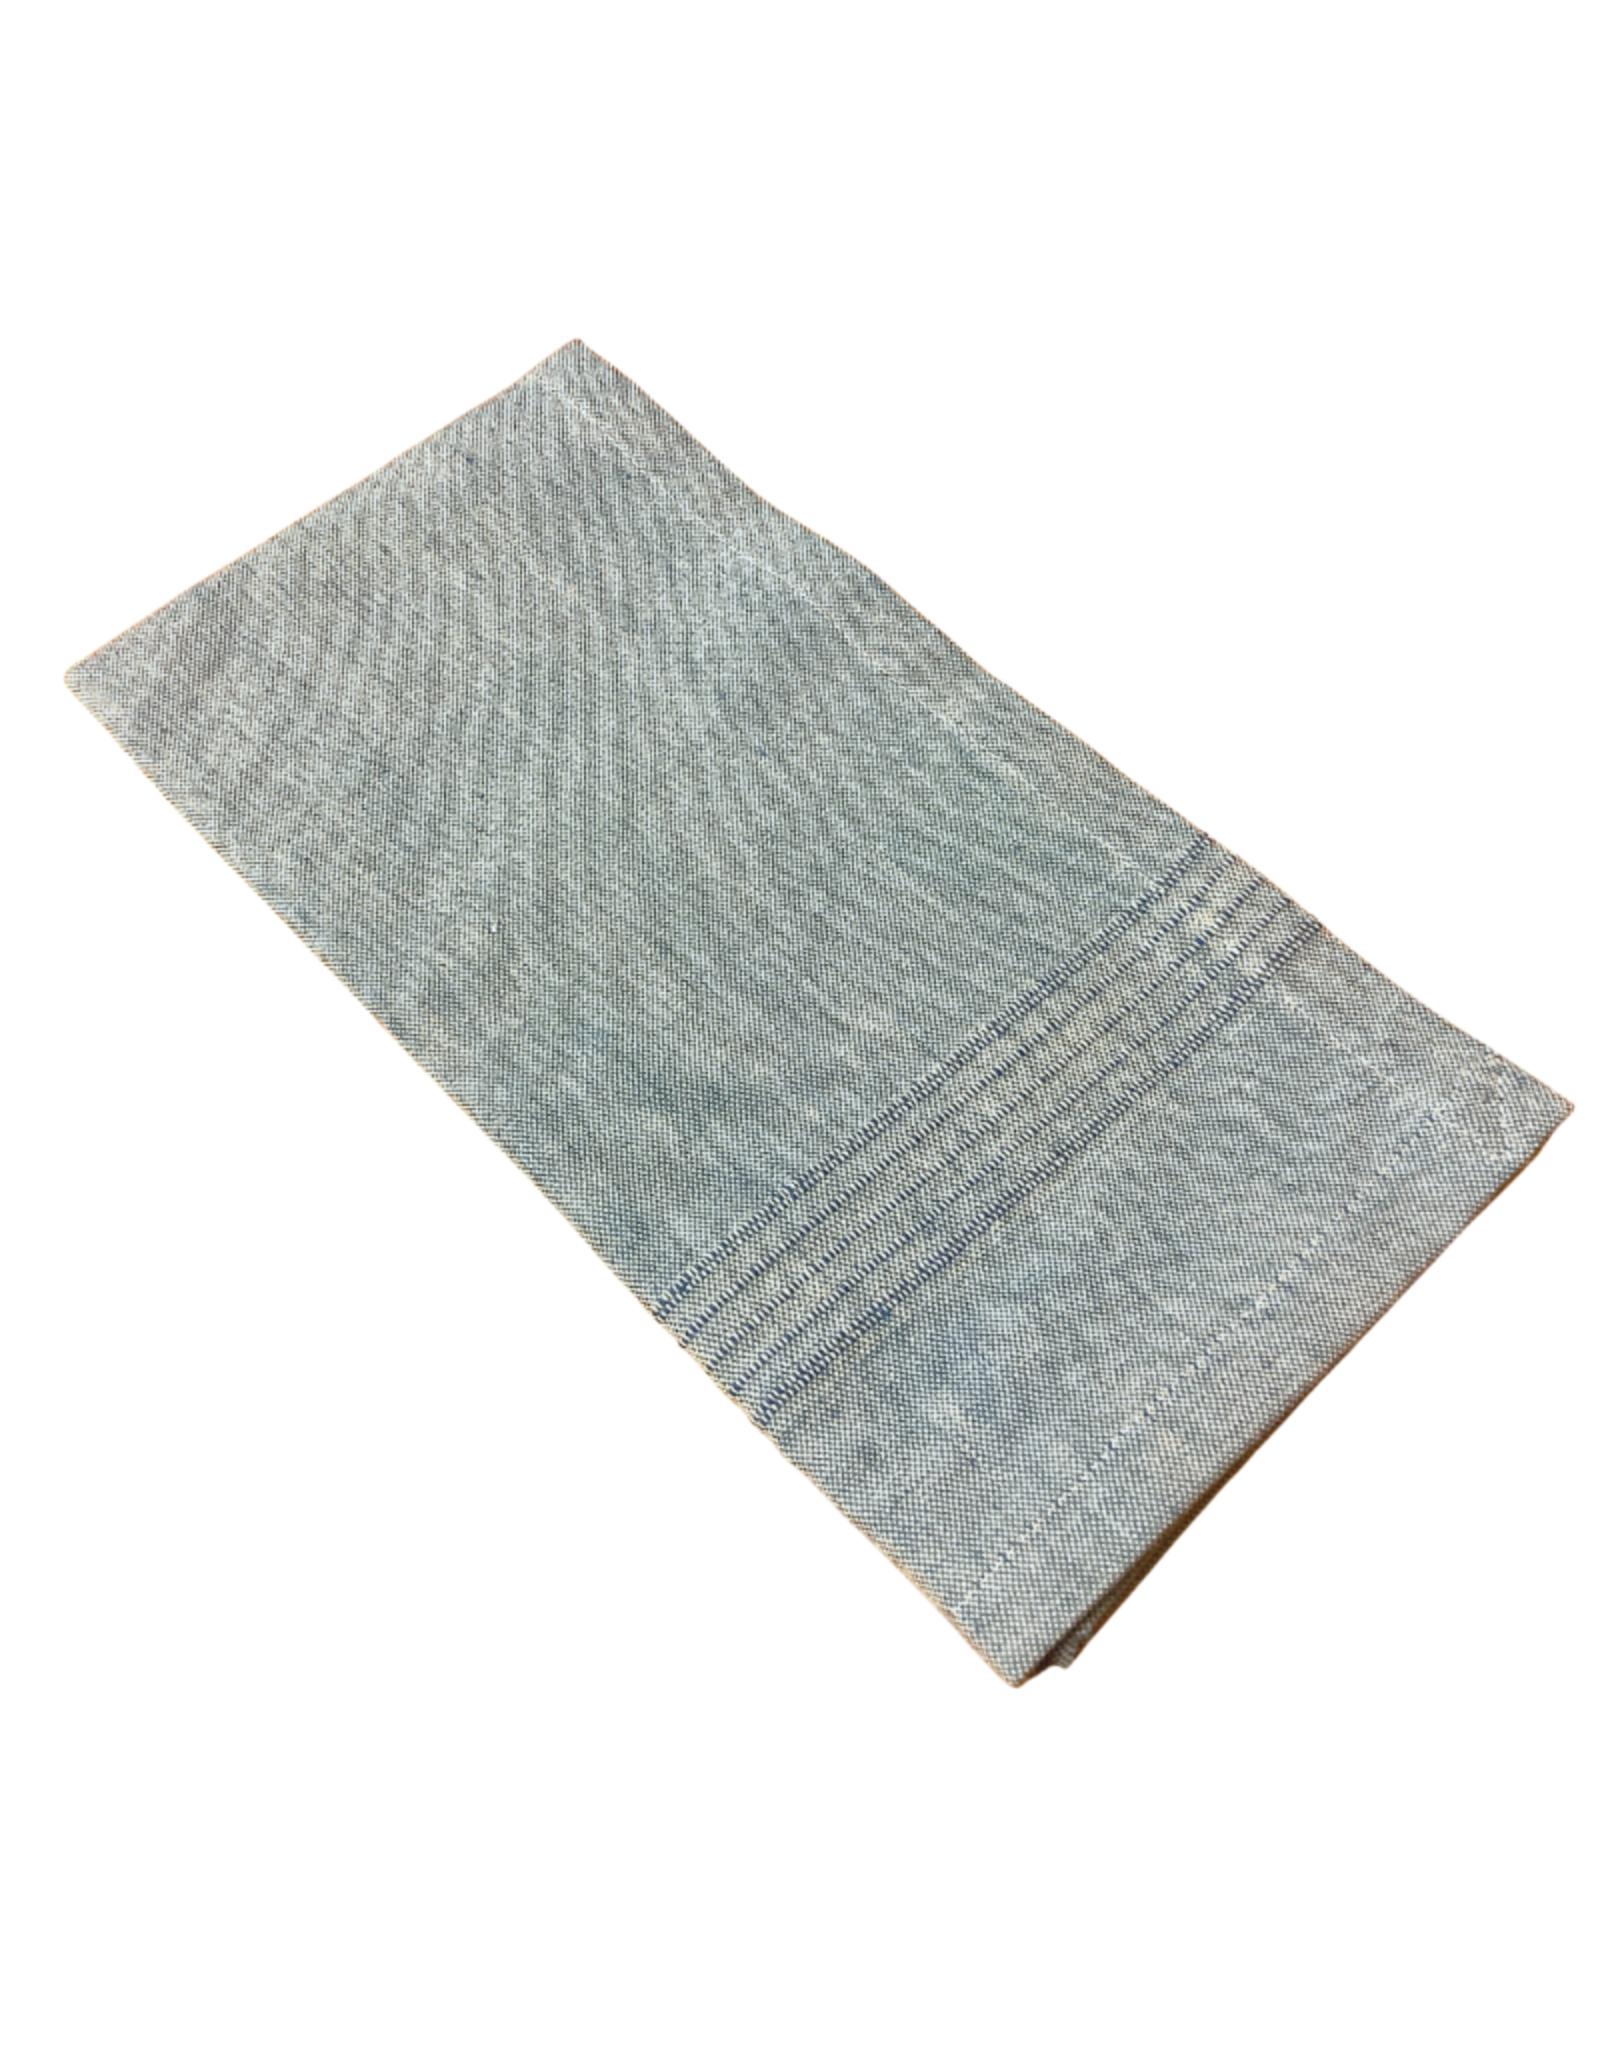 Soft Blue Cotton Napkin